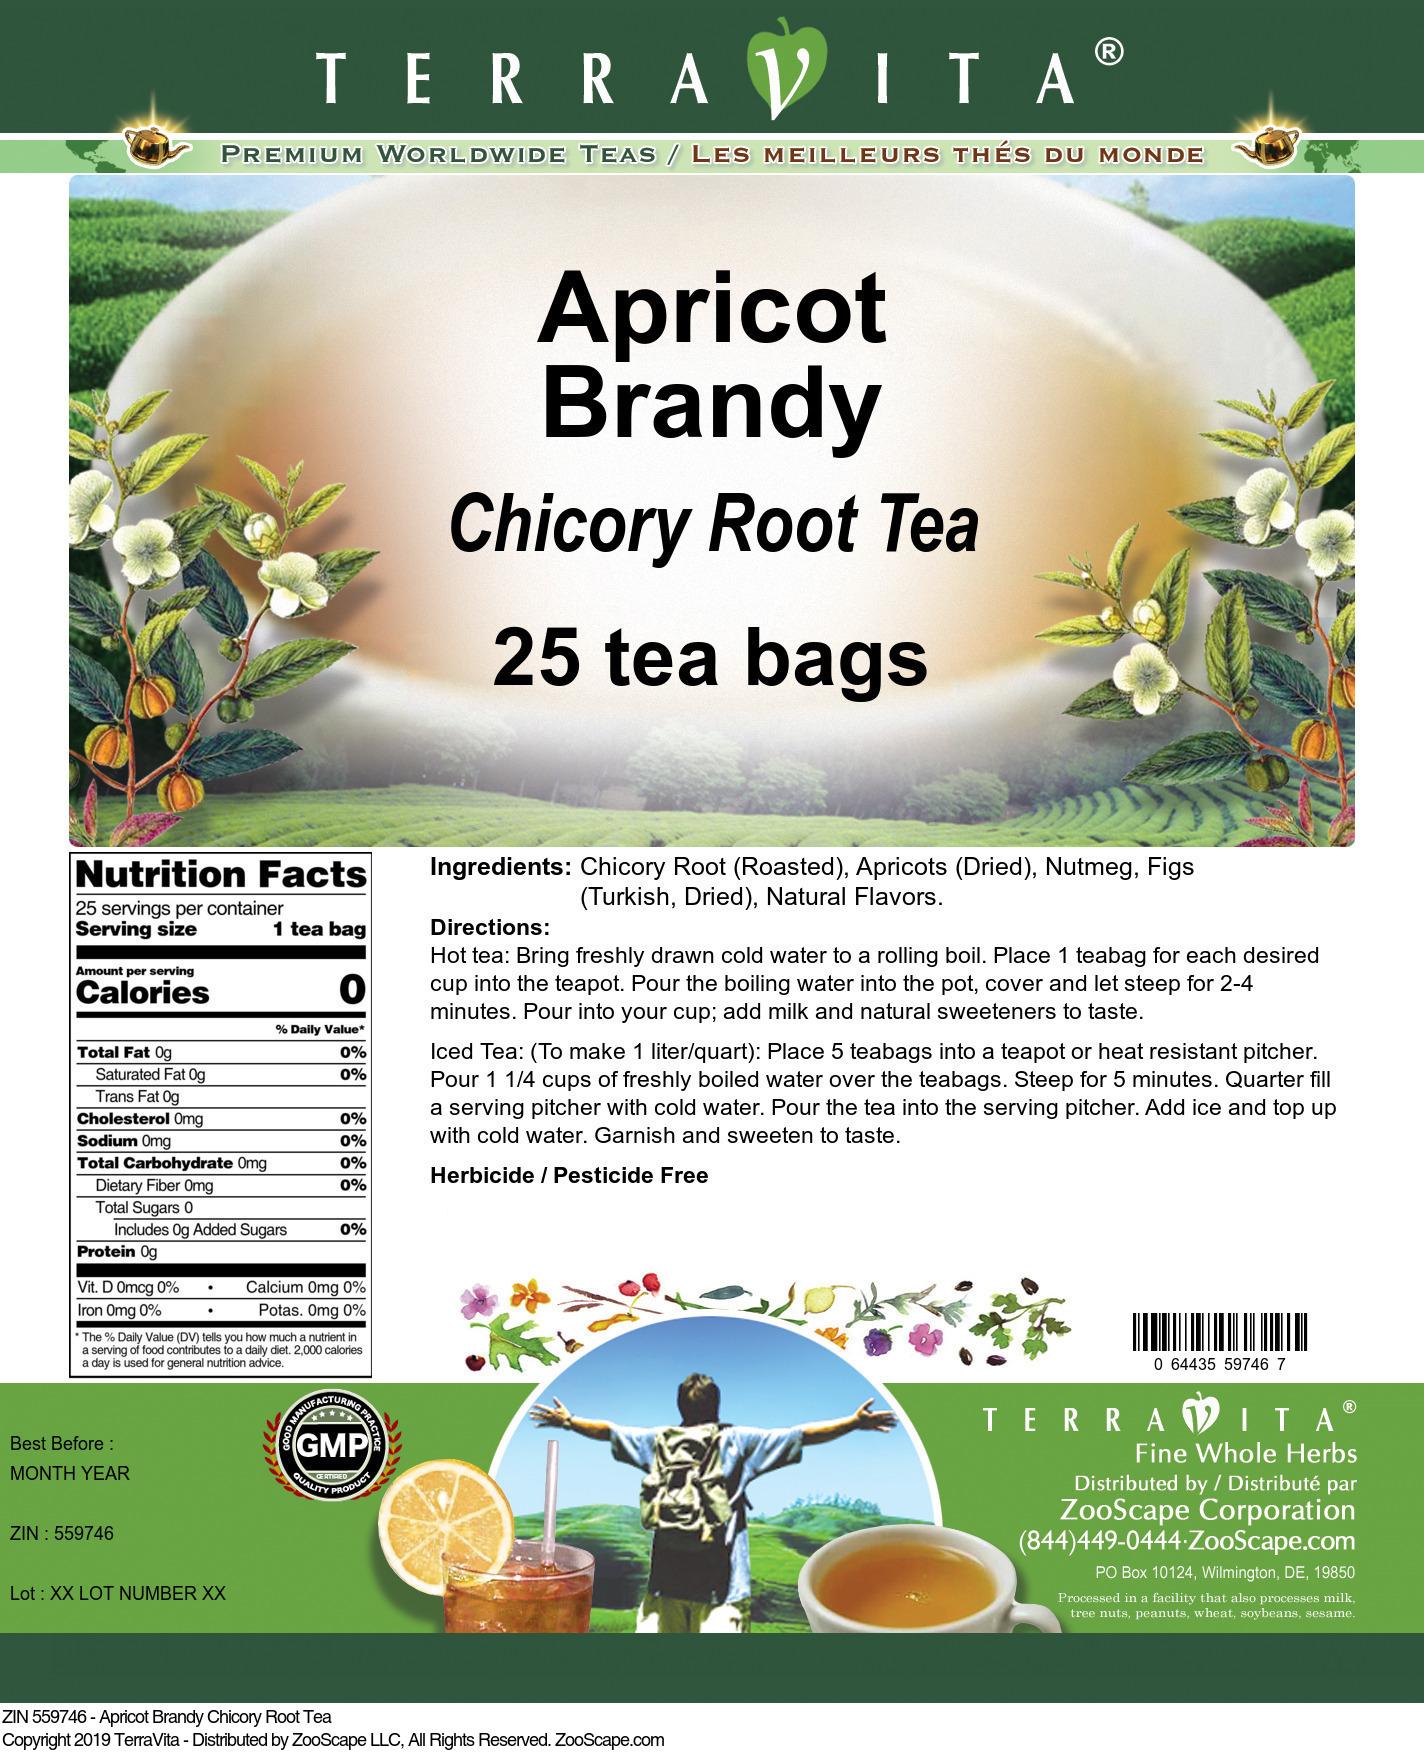 Apricot Brandy Chicory Root